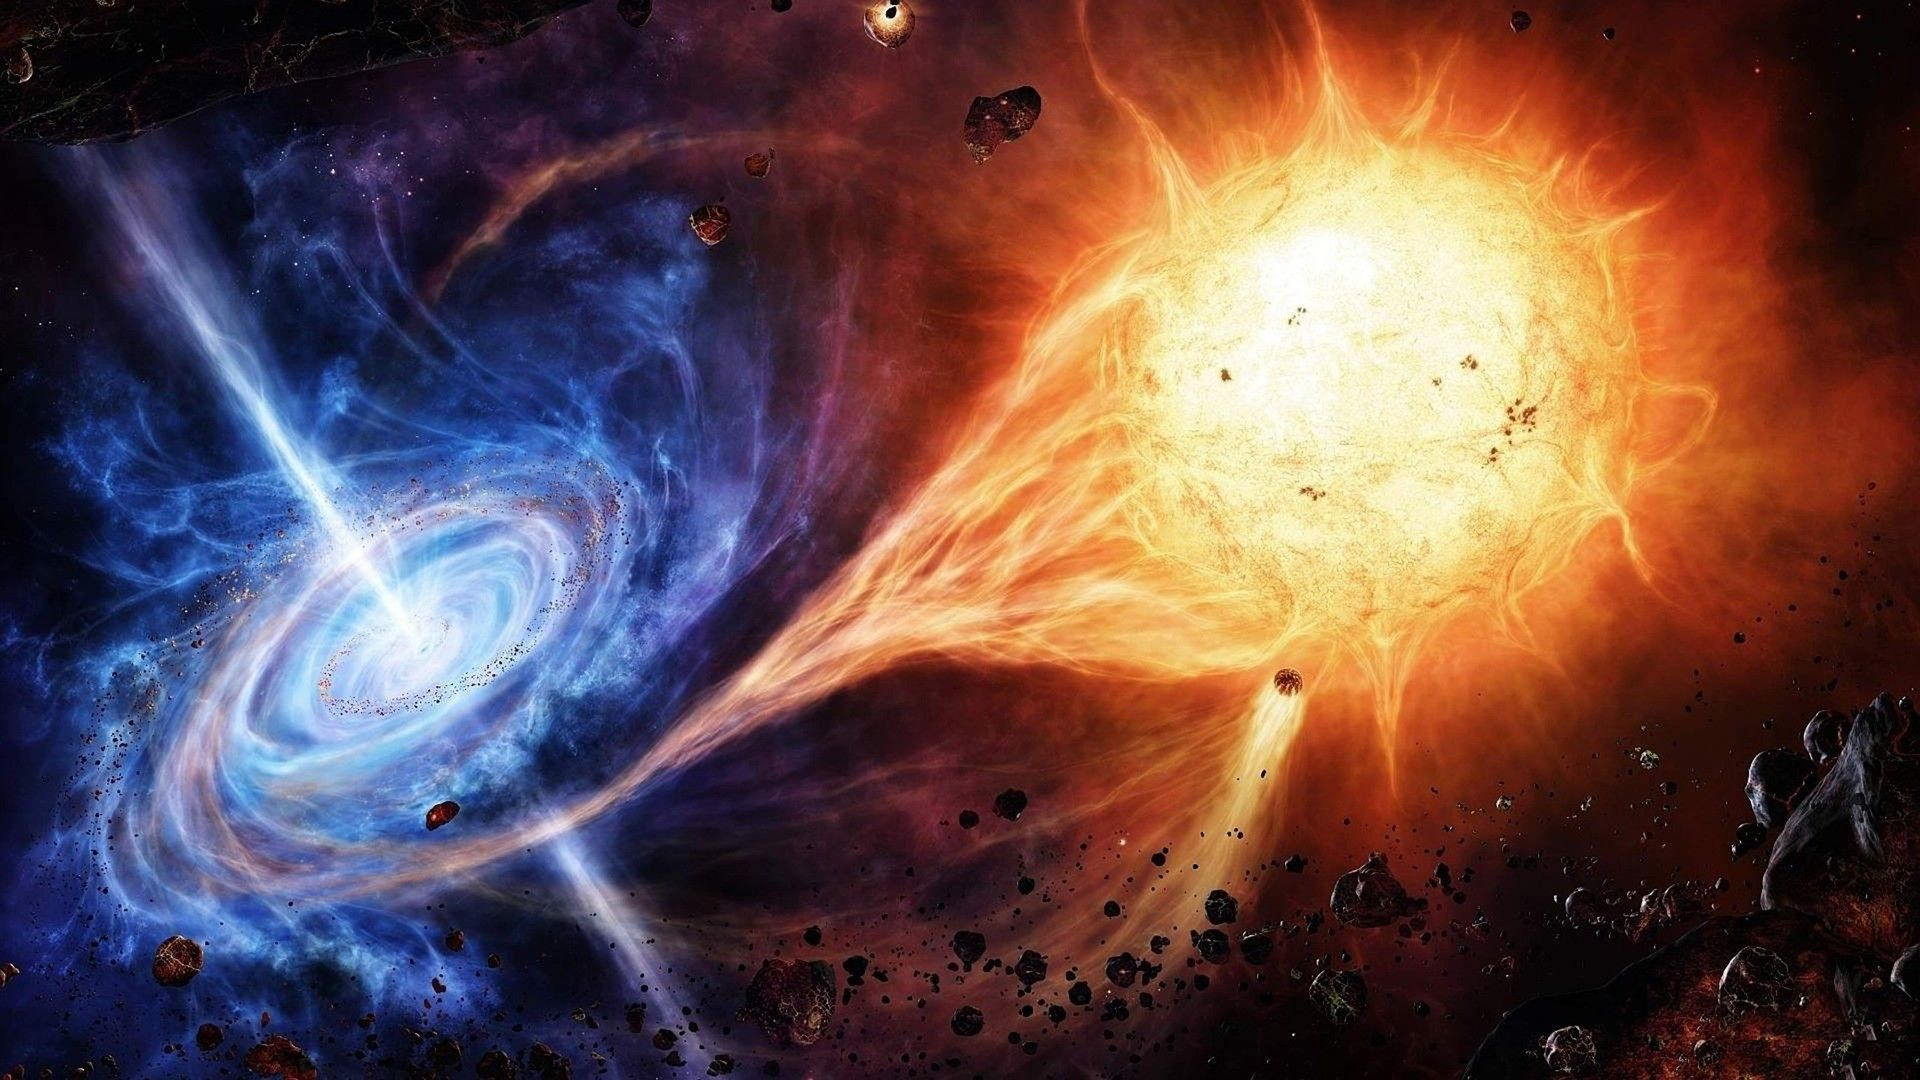 1920x1080 Universe Wallpaper 1920x1080 Wallpaper Black Hole Wallpaper Space Pictures Black Hole